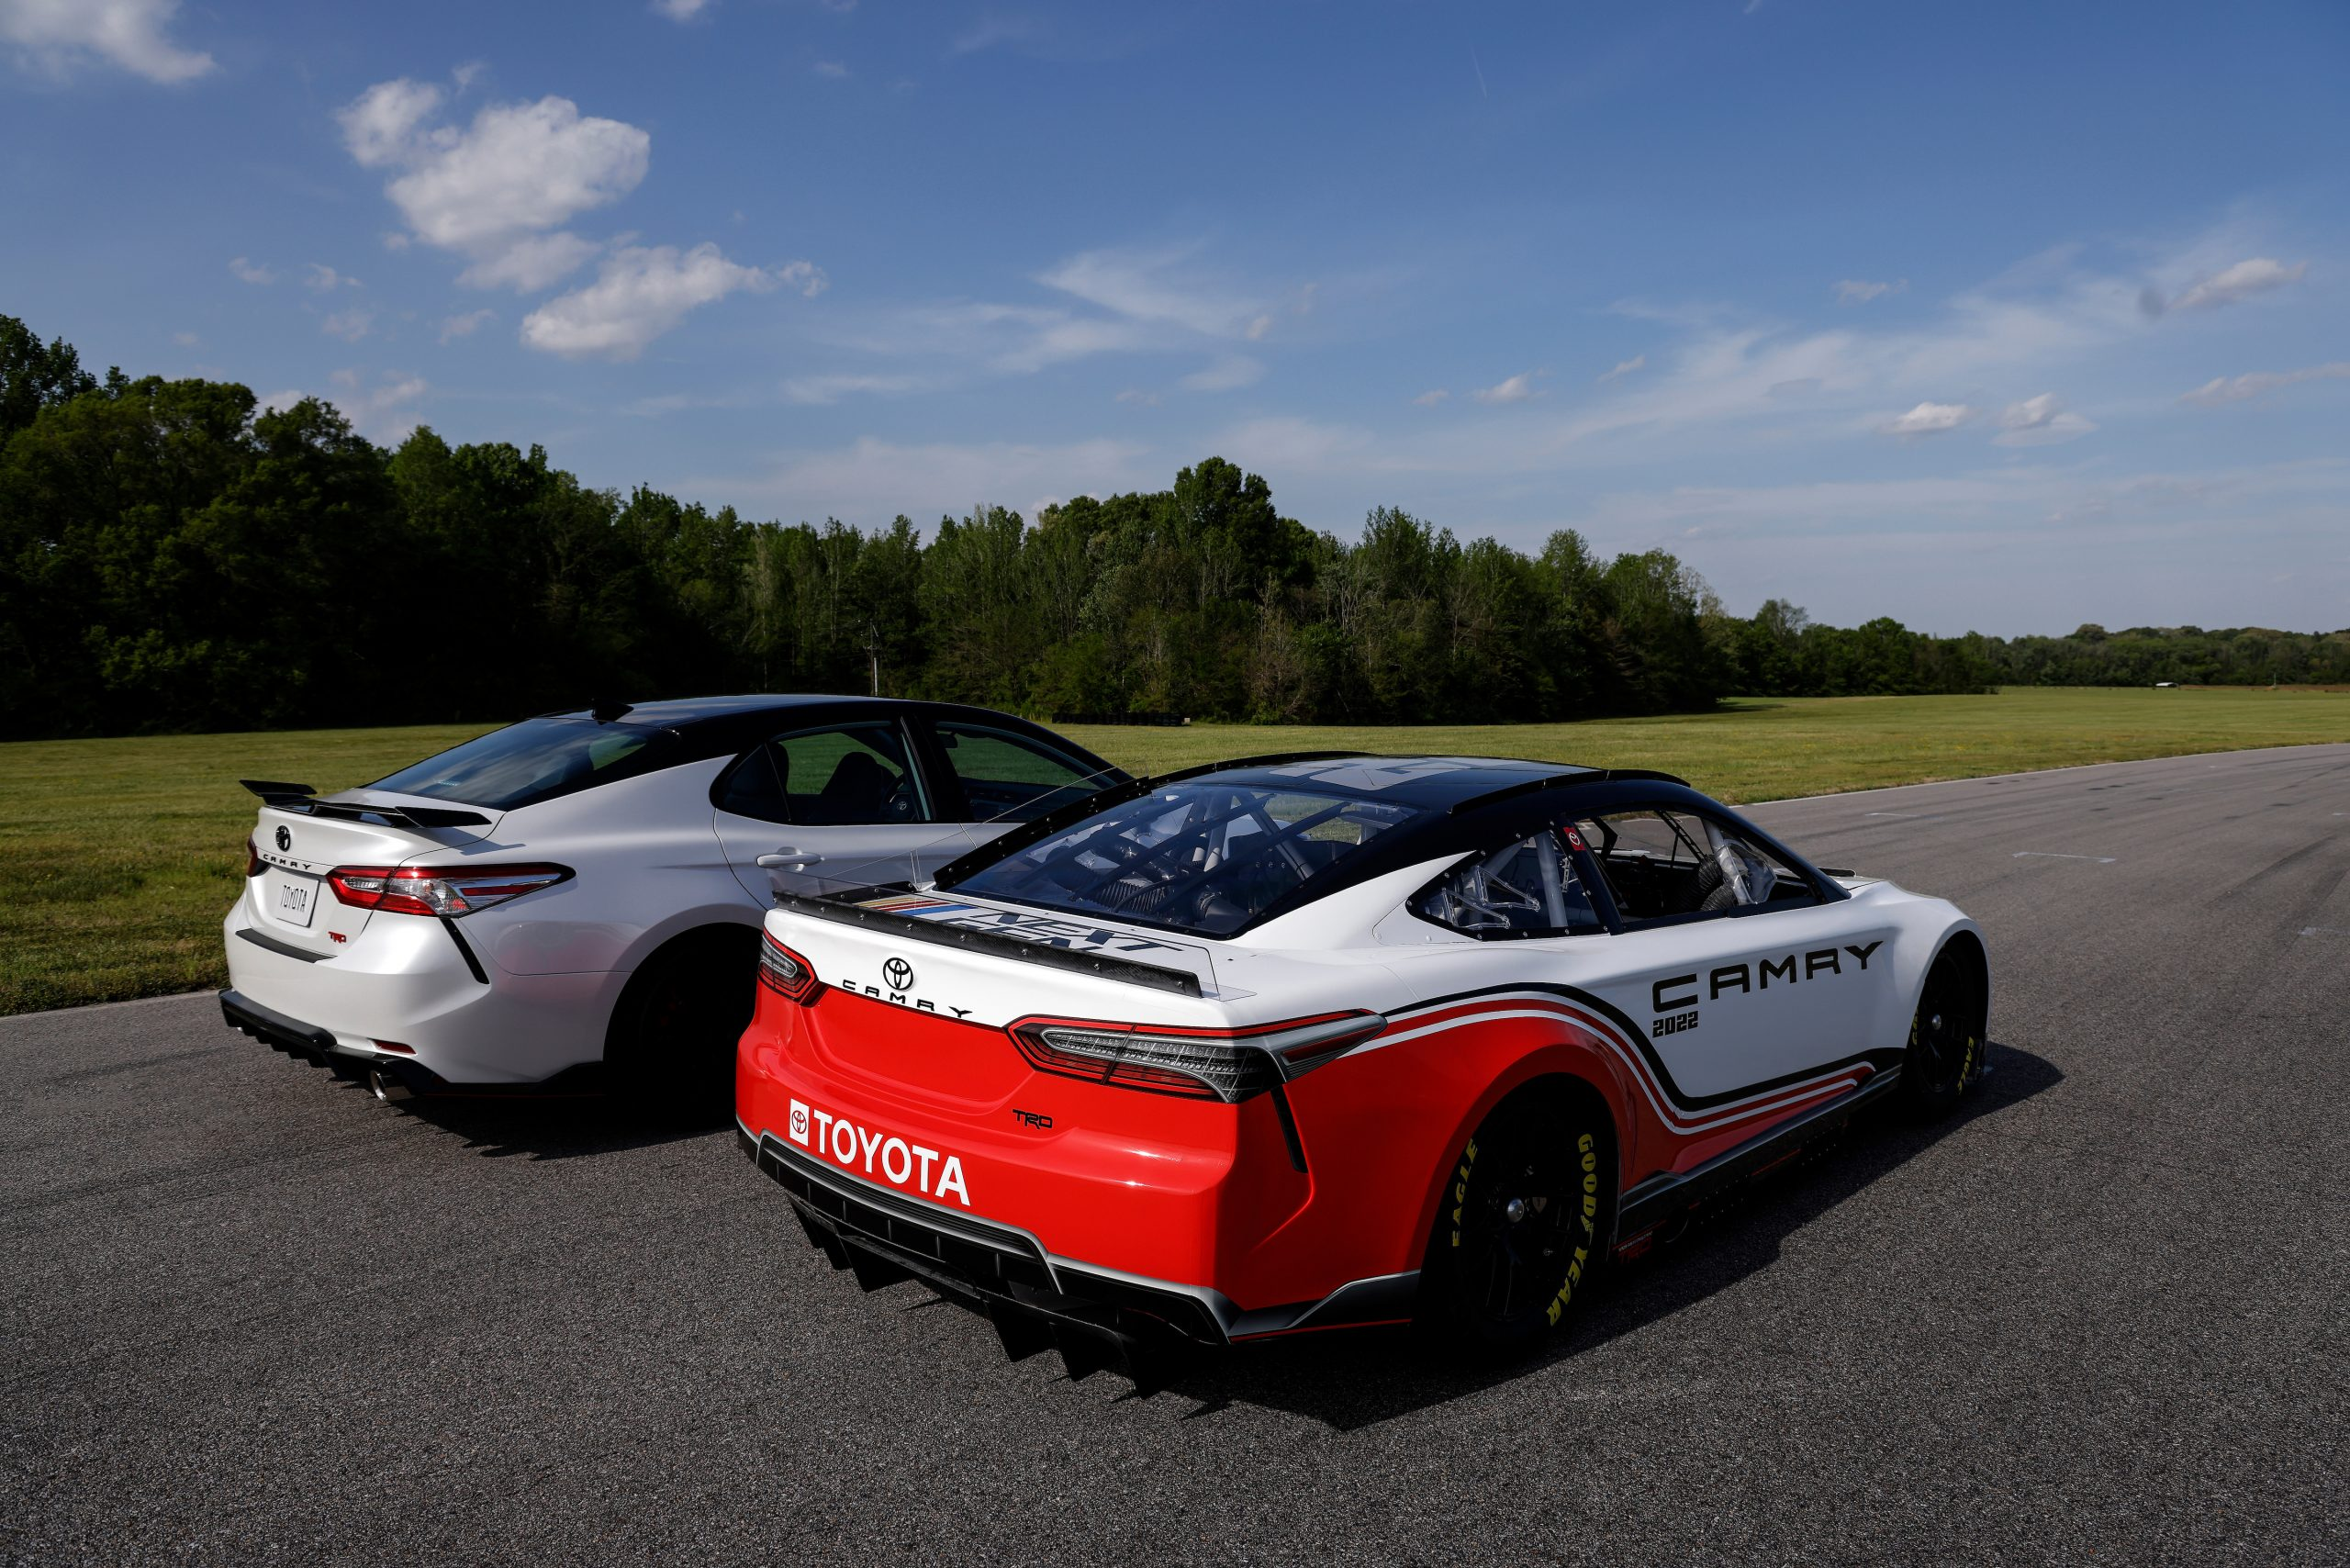 NASCAR Toyota Stock car camry rear